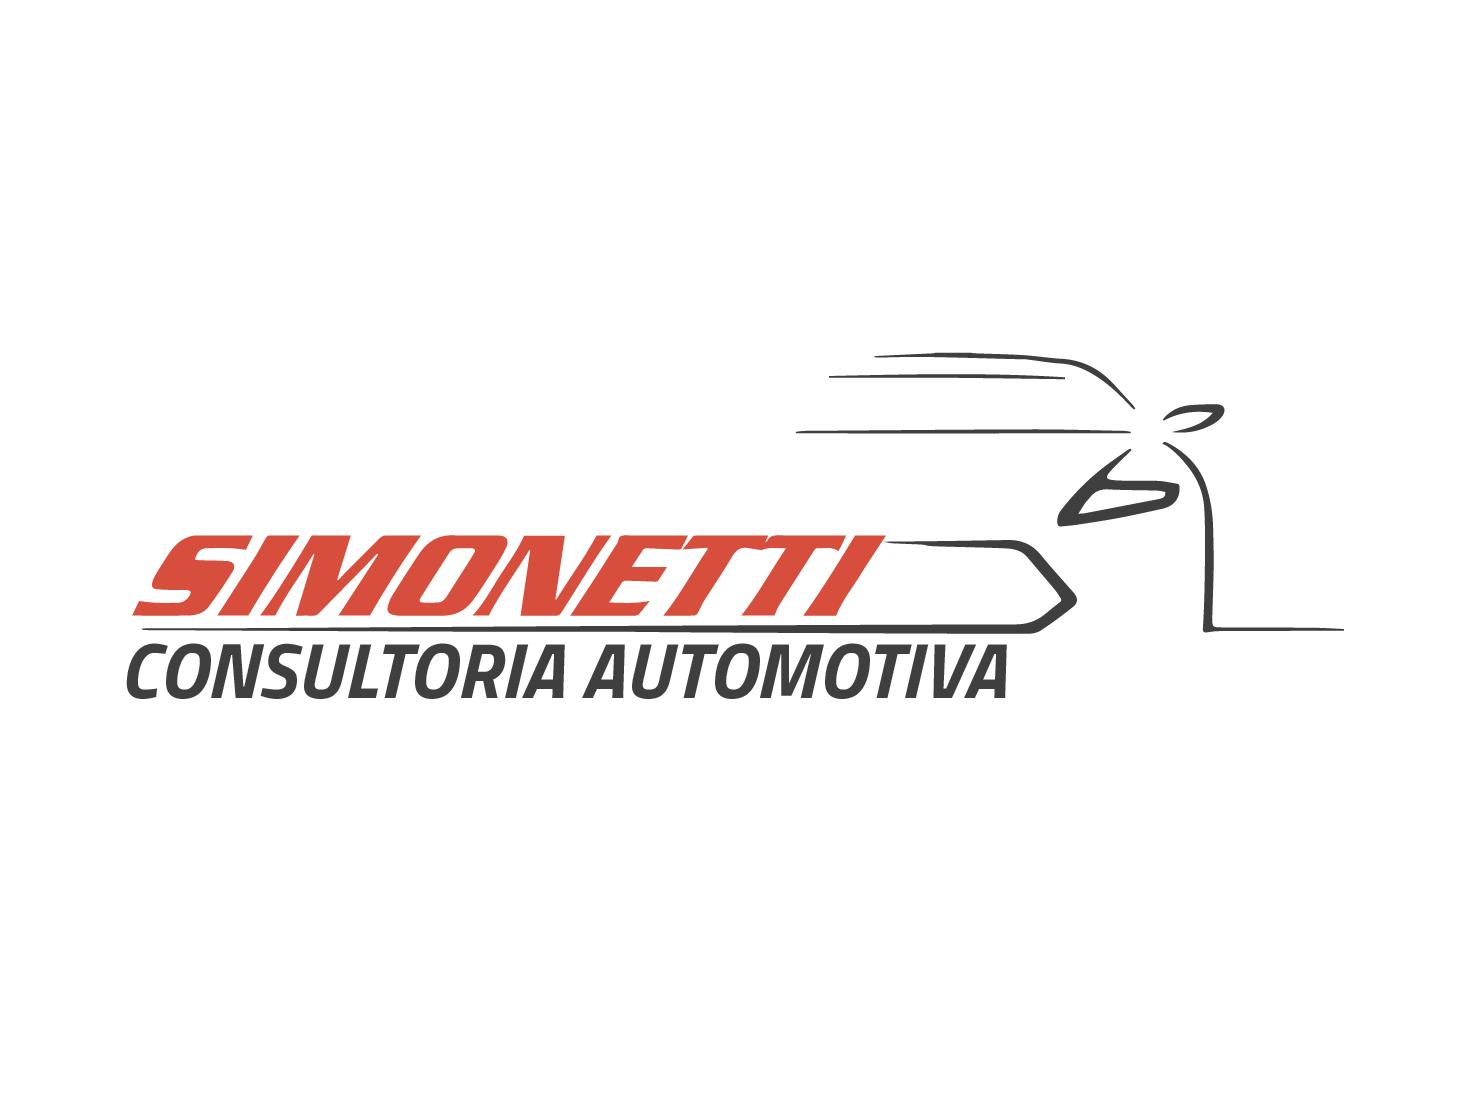 Simonetti Consultoria Automotiva